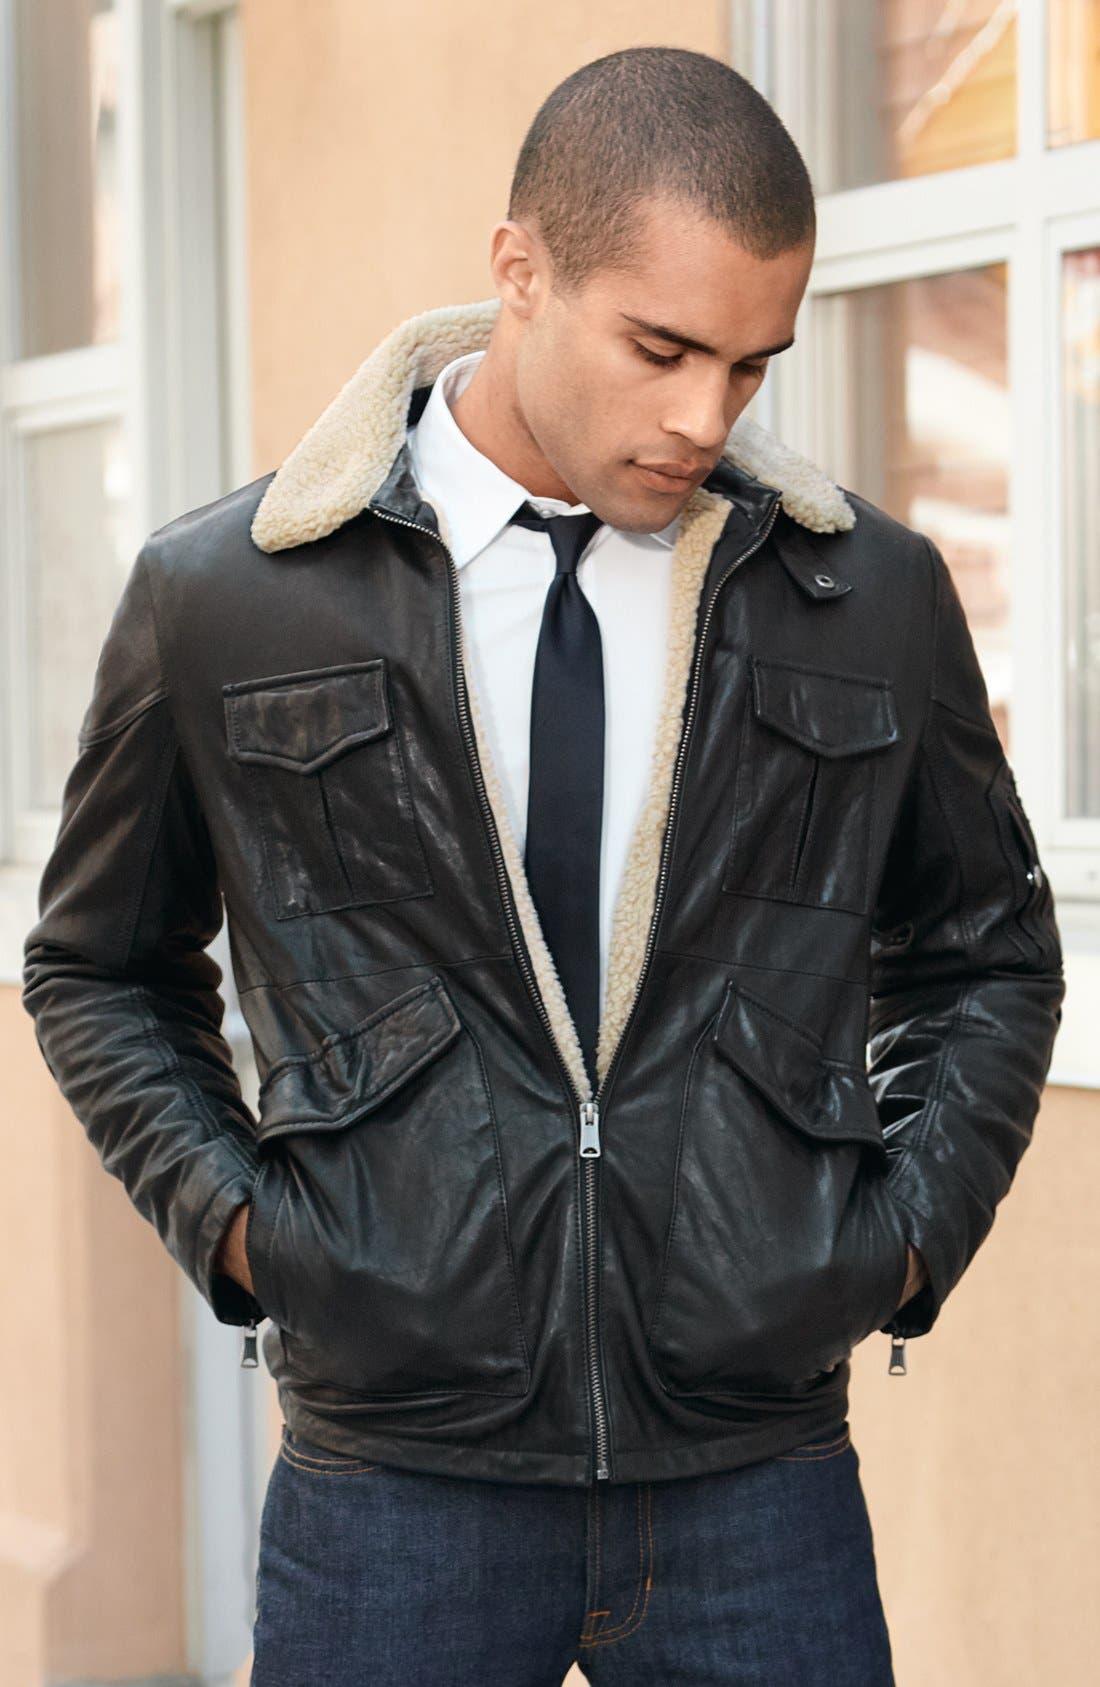 Main Image - Levi's® Bomber Jacket, Sovereign Code Shirt & rag & bone Slim Straight Leg Jeans